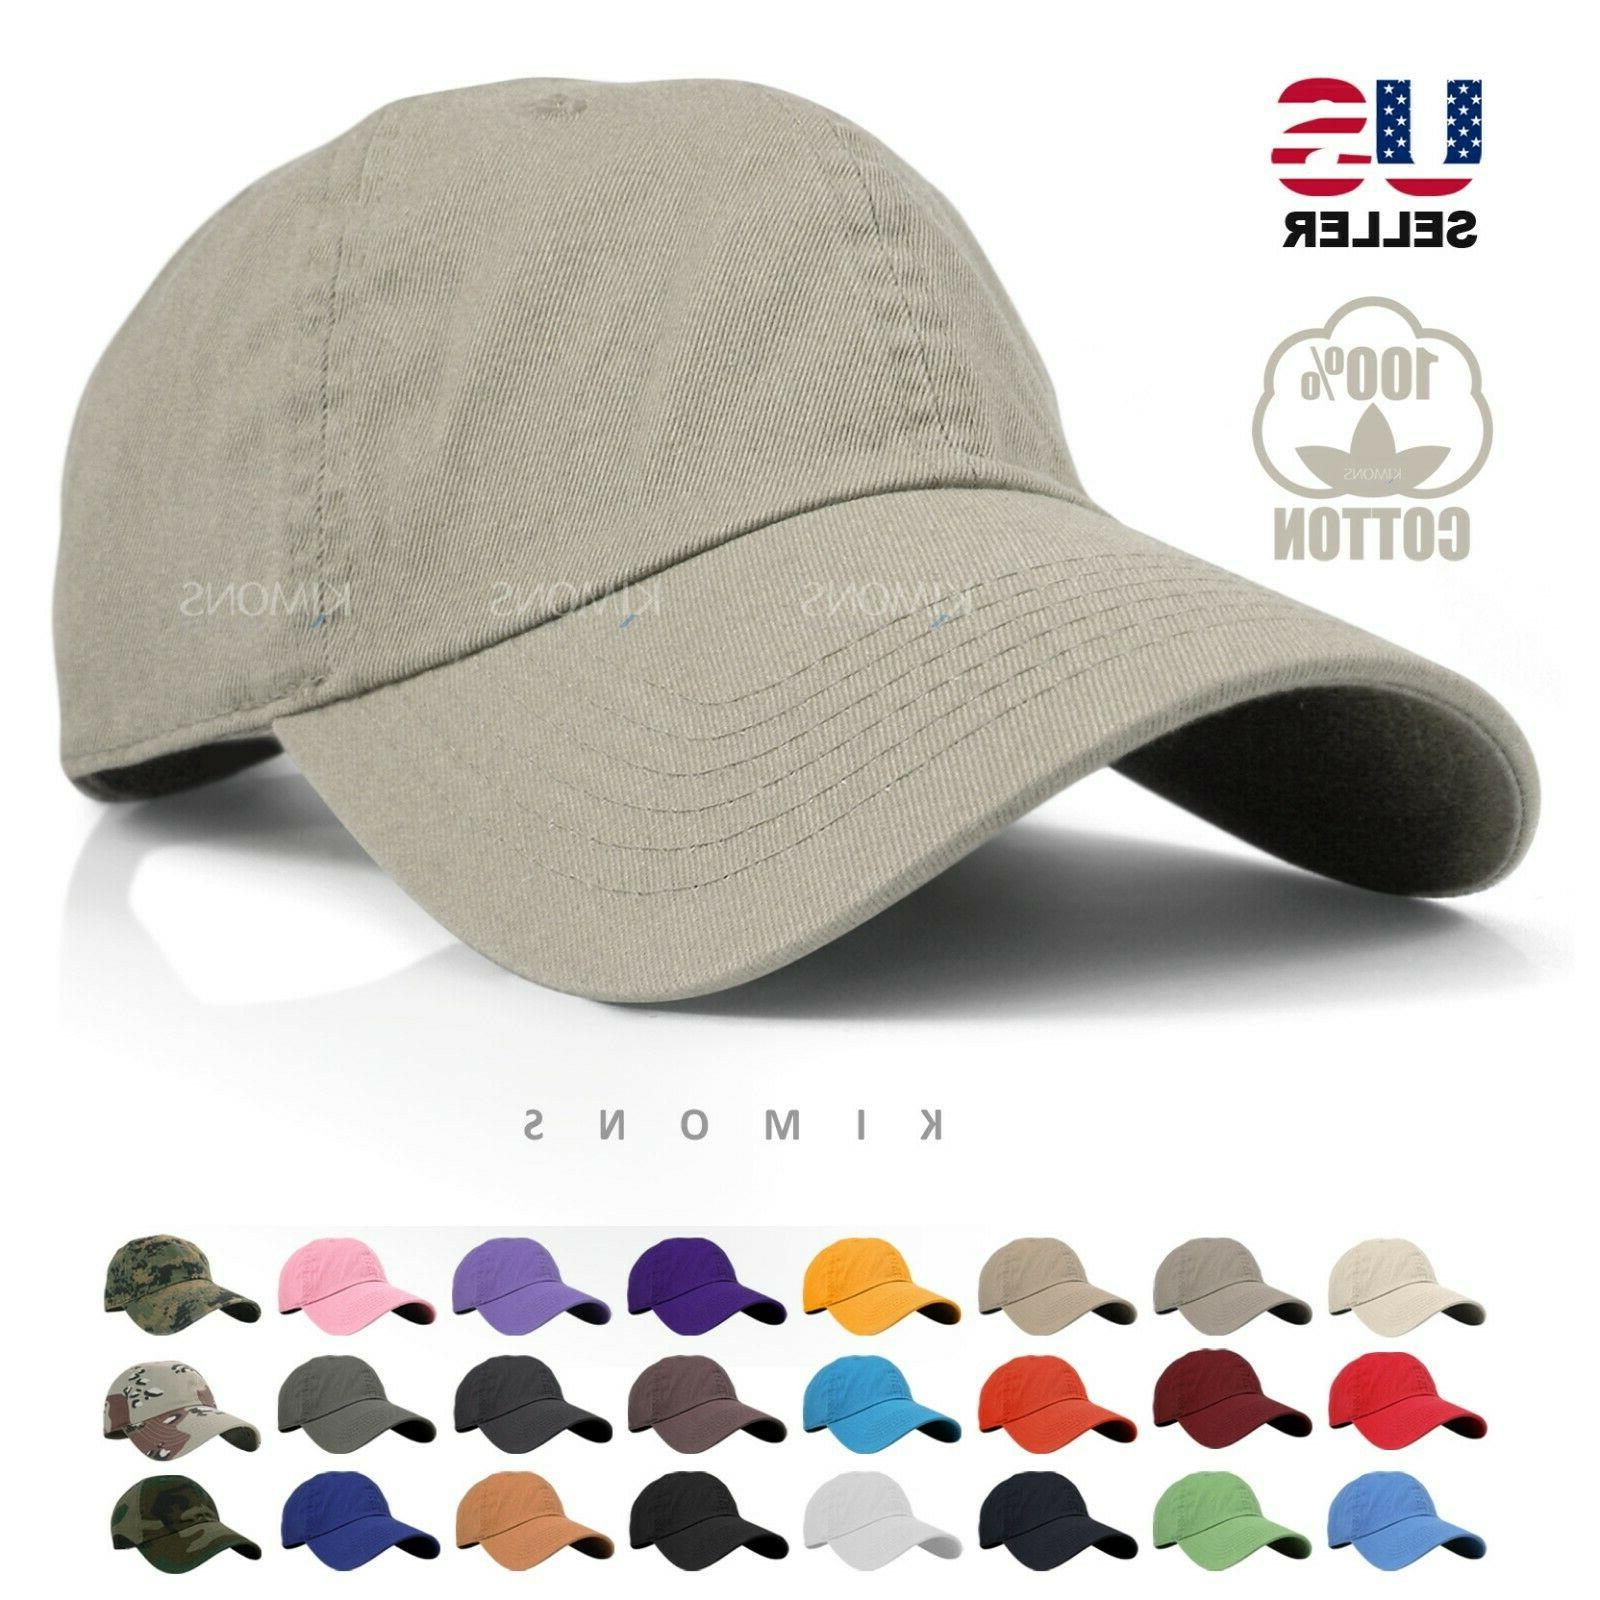 cotton cap baseball caps hat adjustable polo